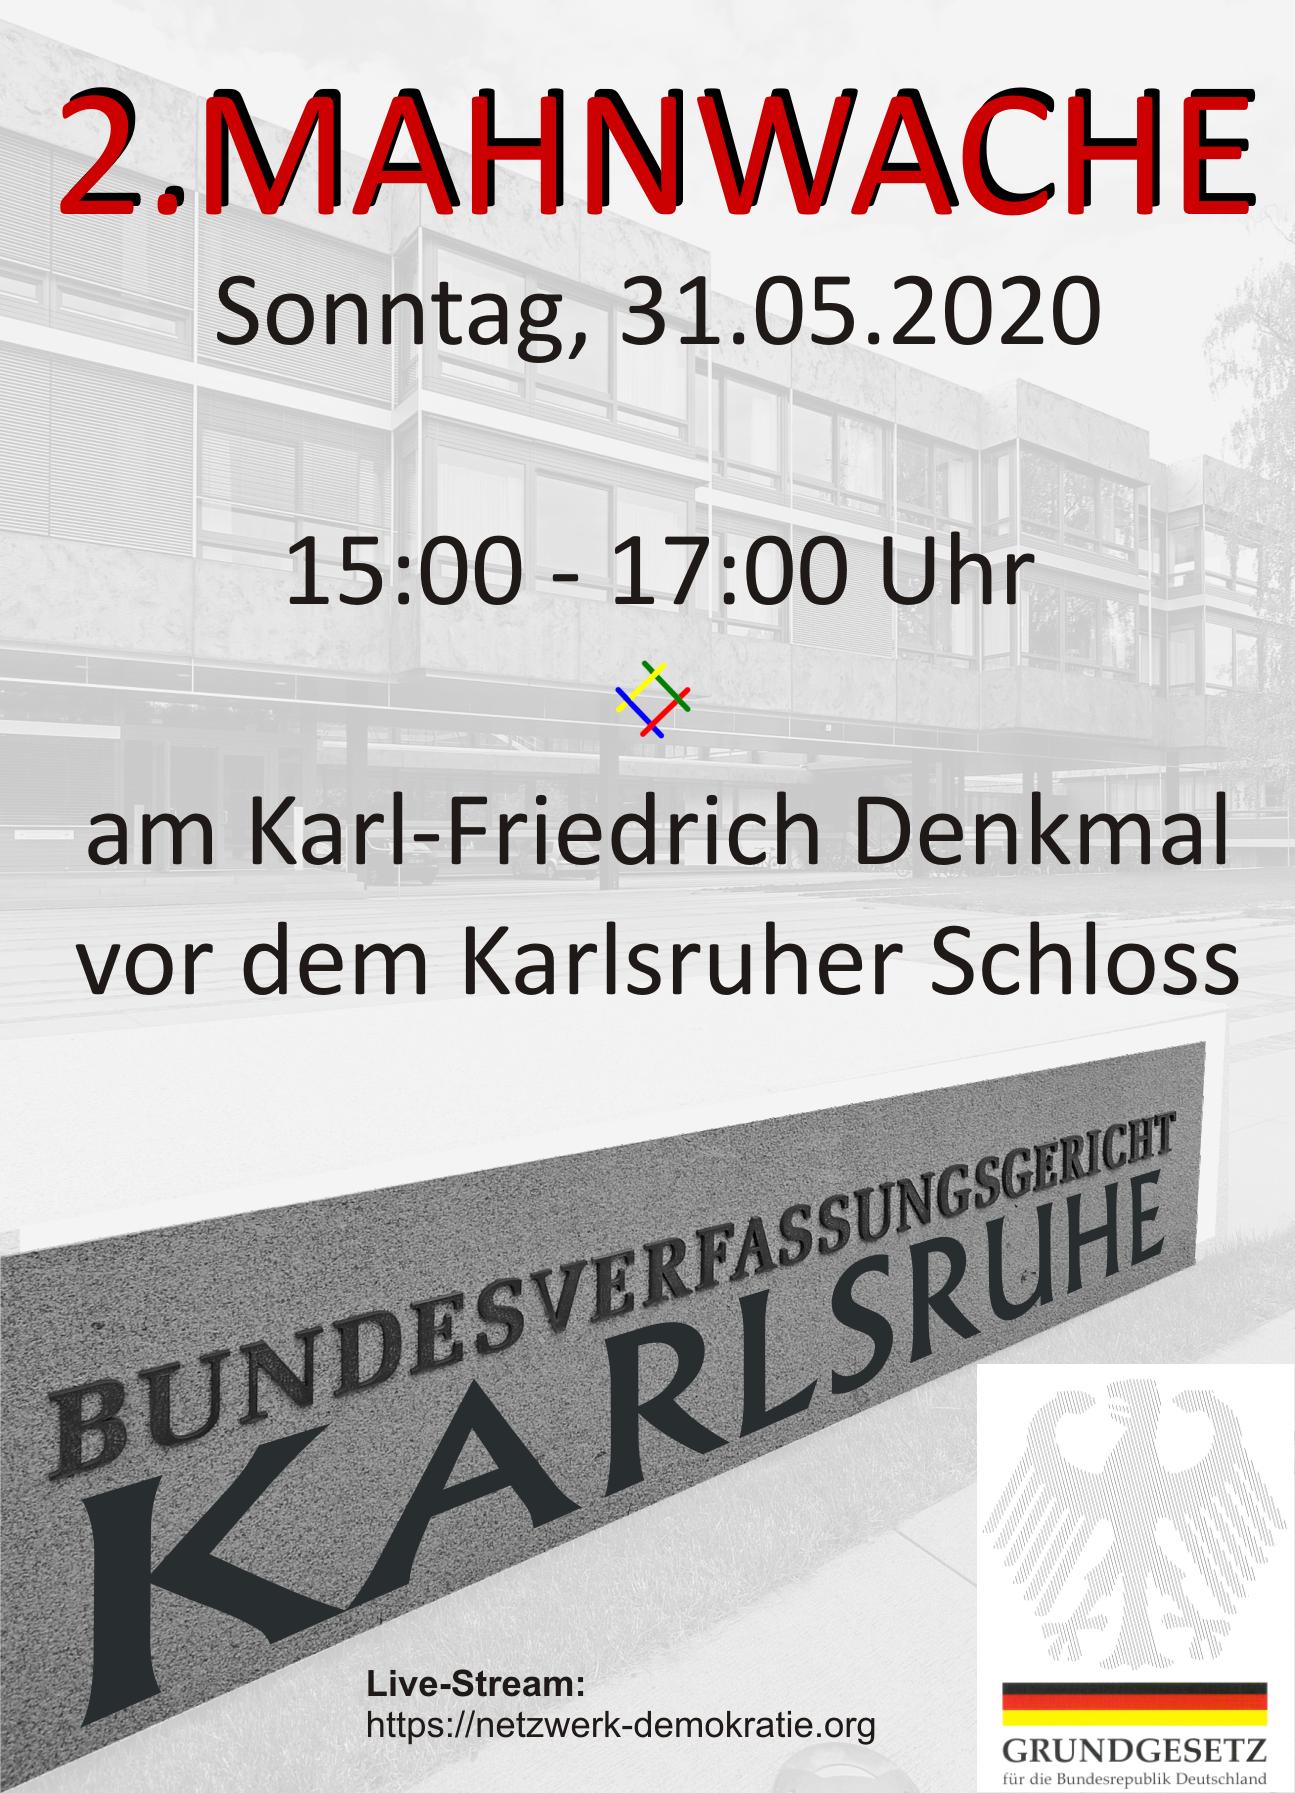 2. Mahnwache Karlsruhe Schlossplatz